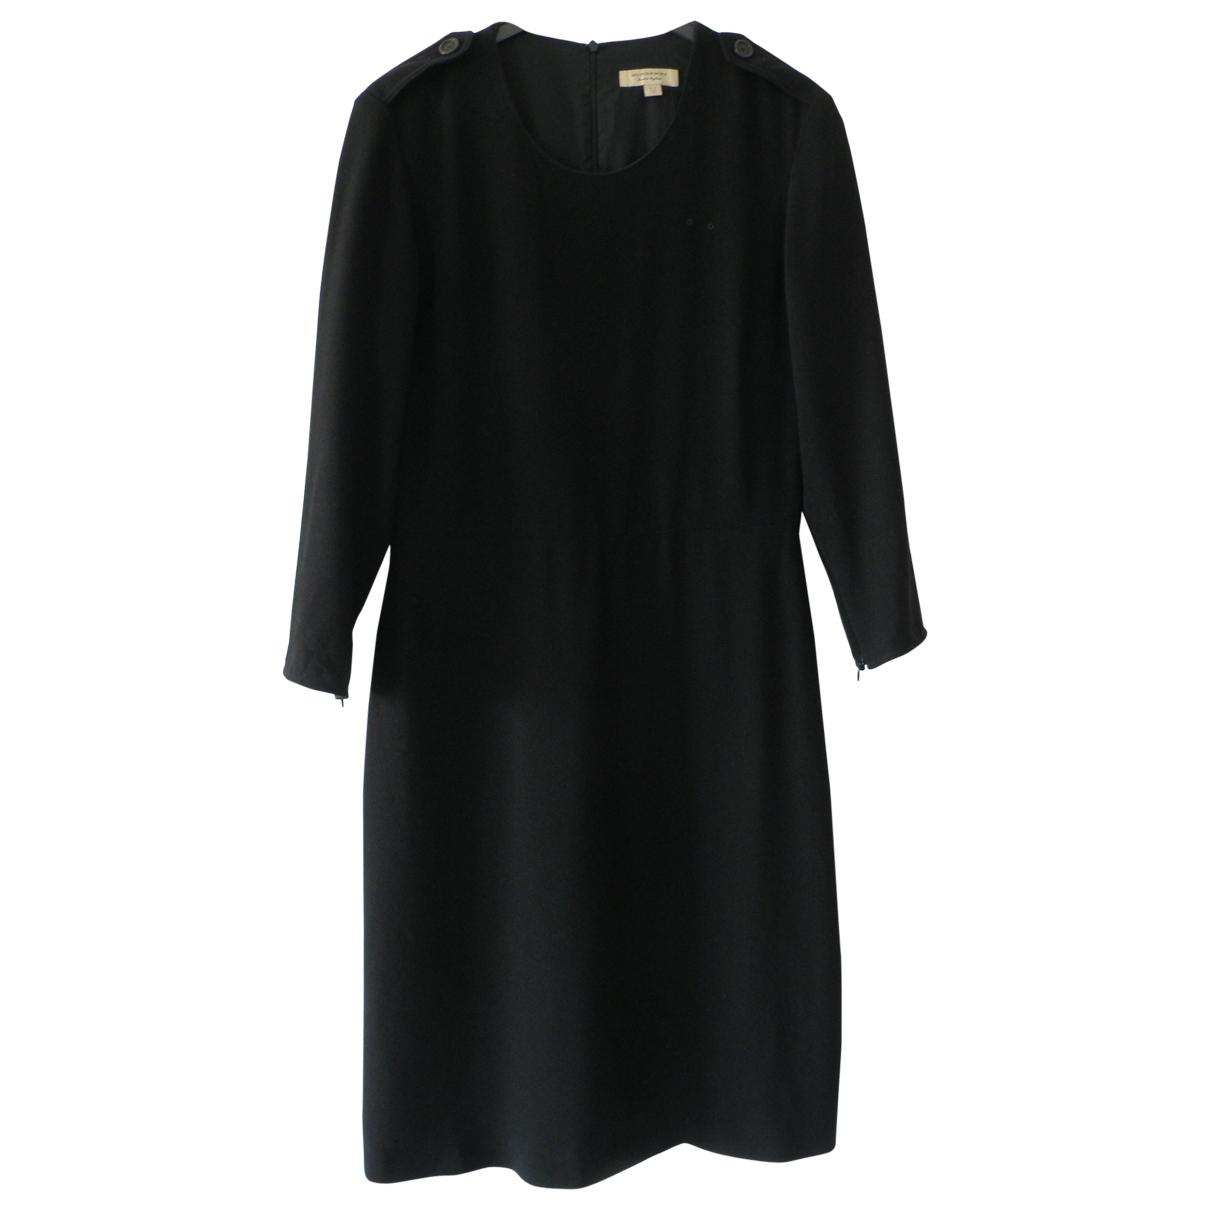 Burberry \N Black dress for Women 42 IT